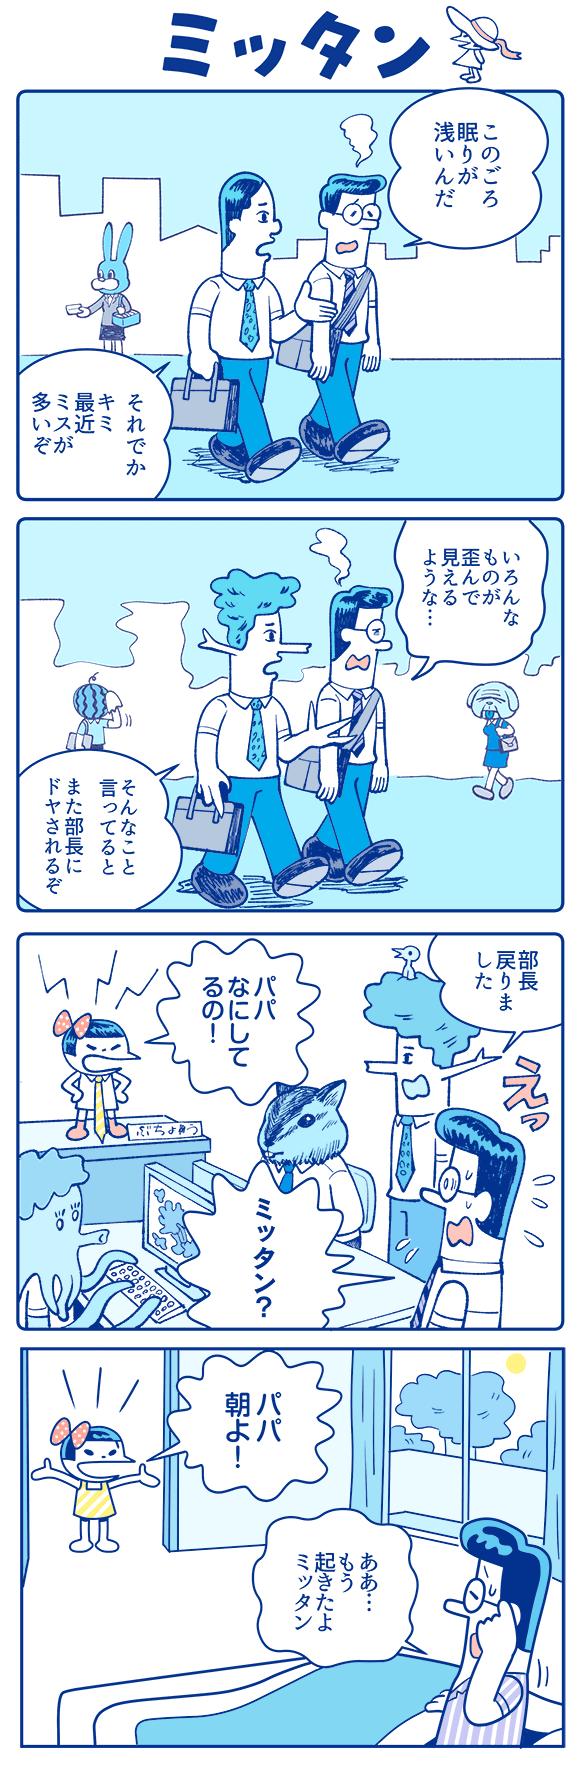 mon_20180723_img1